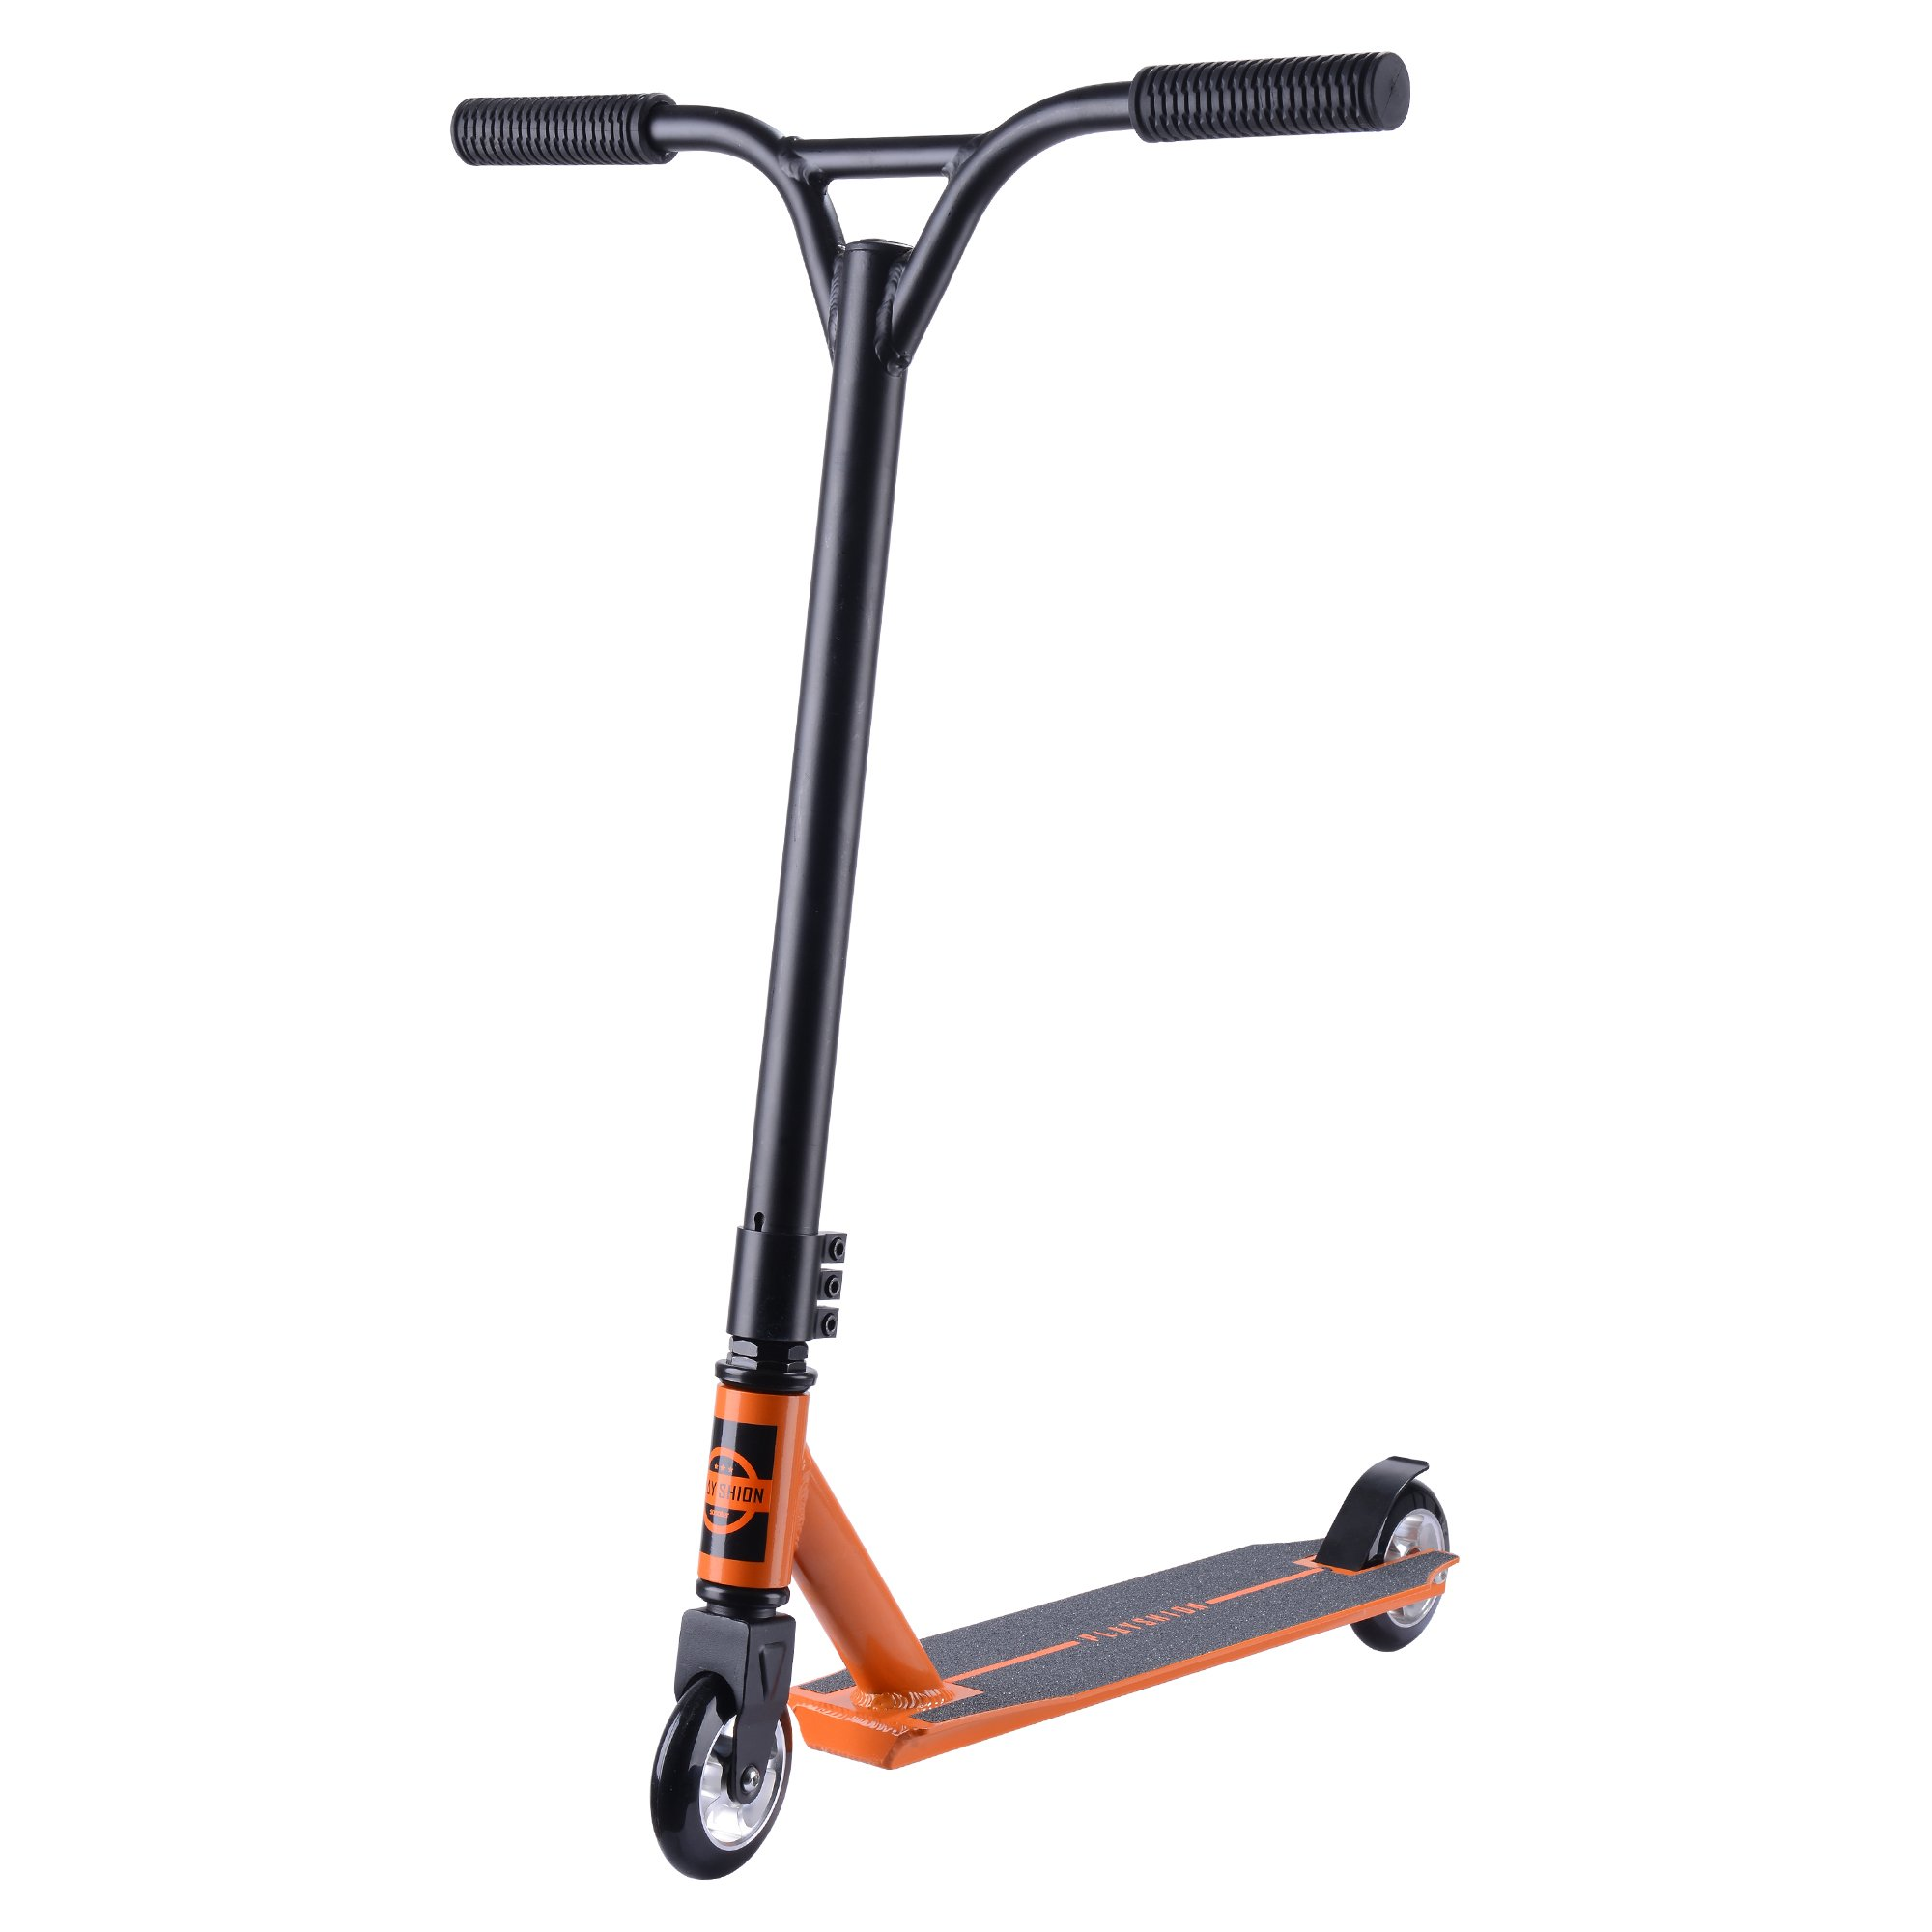 Playshion Lightweight Pro Stunt Scooter (31.5'' Tall) (orange)